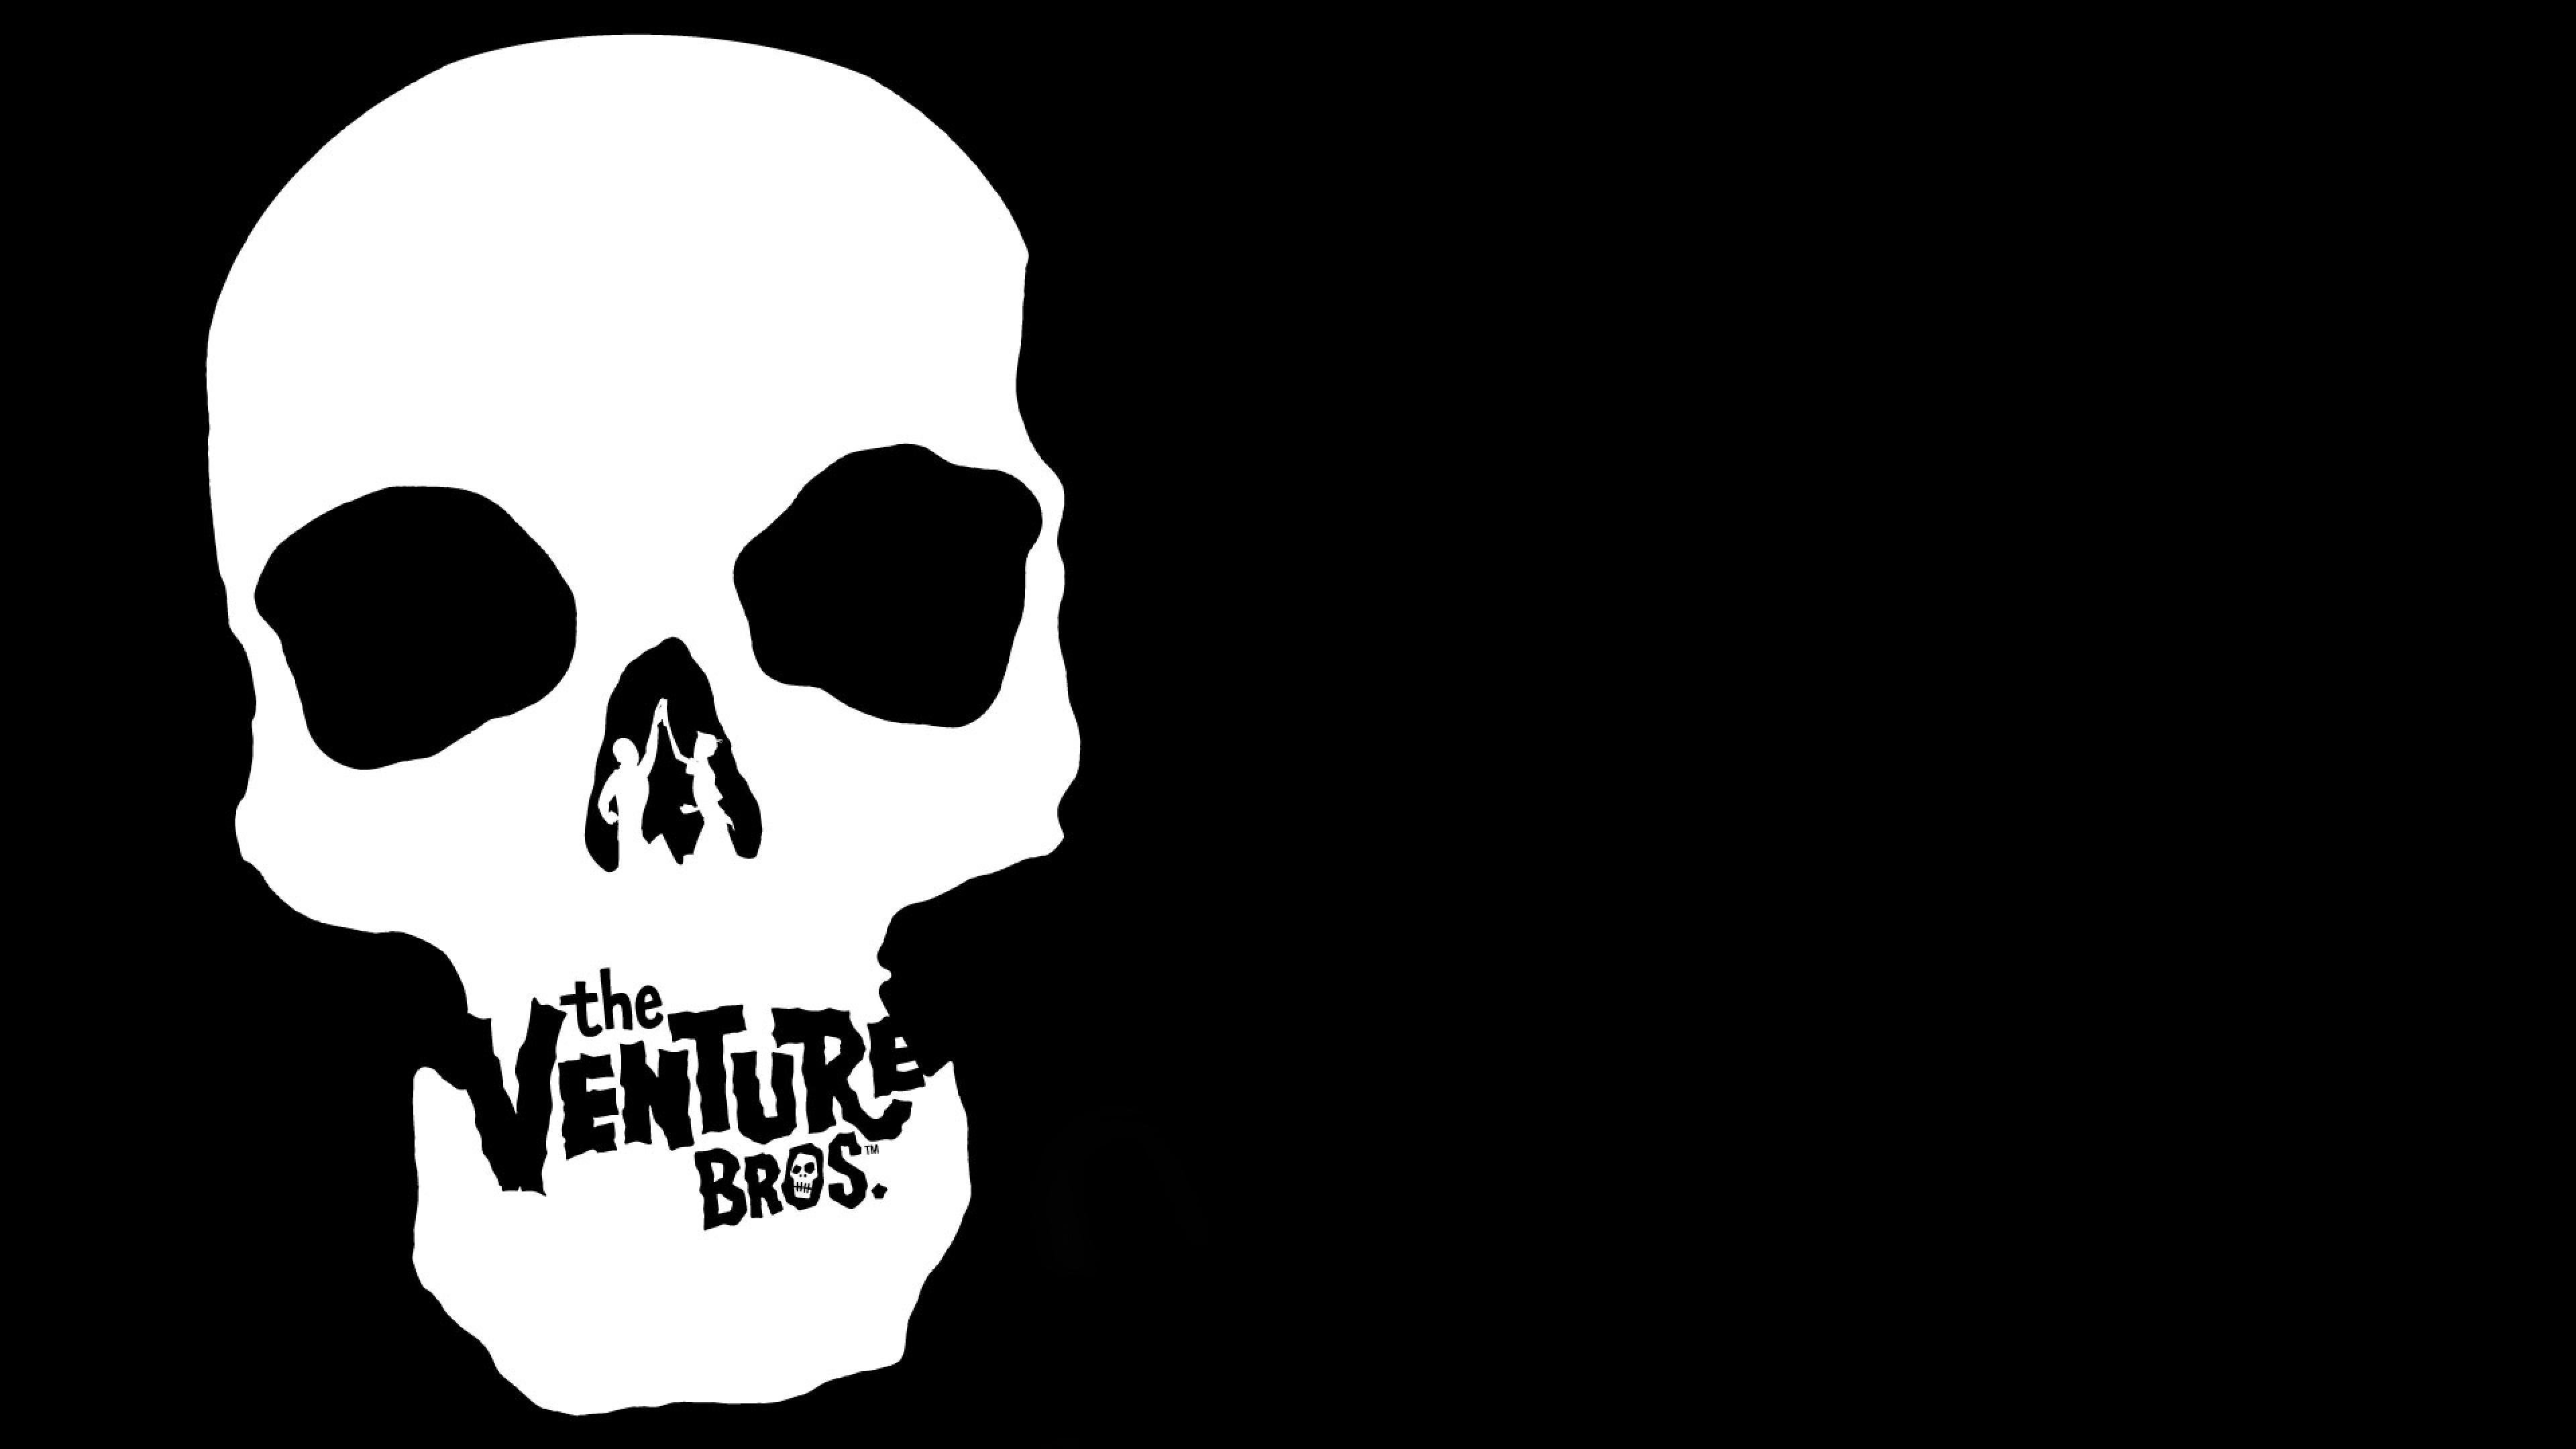 Download Download The Venture Bros Desktop Wallpaper HD 5x134o2o7c 3840x2160